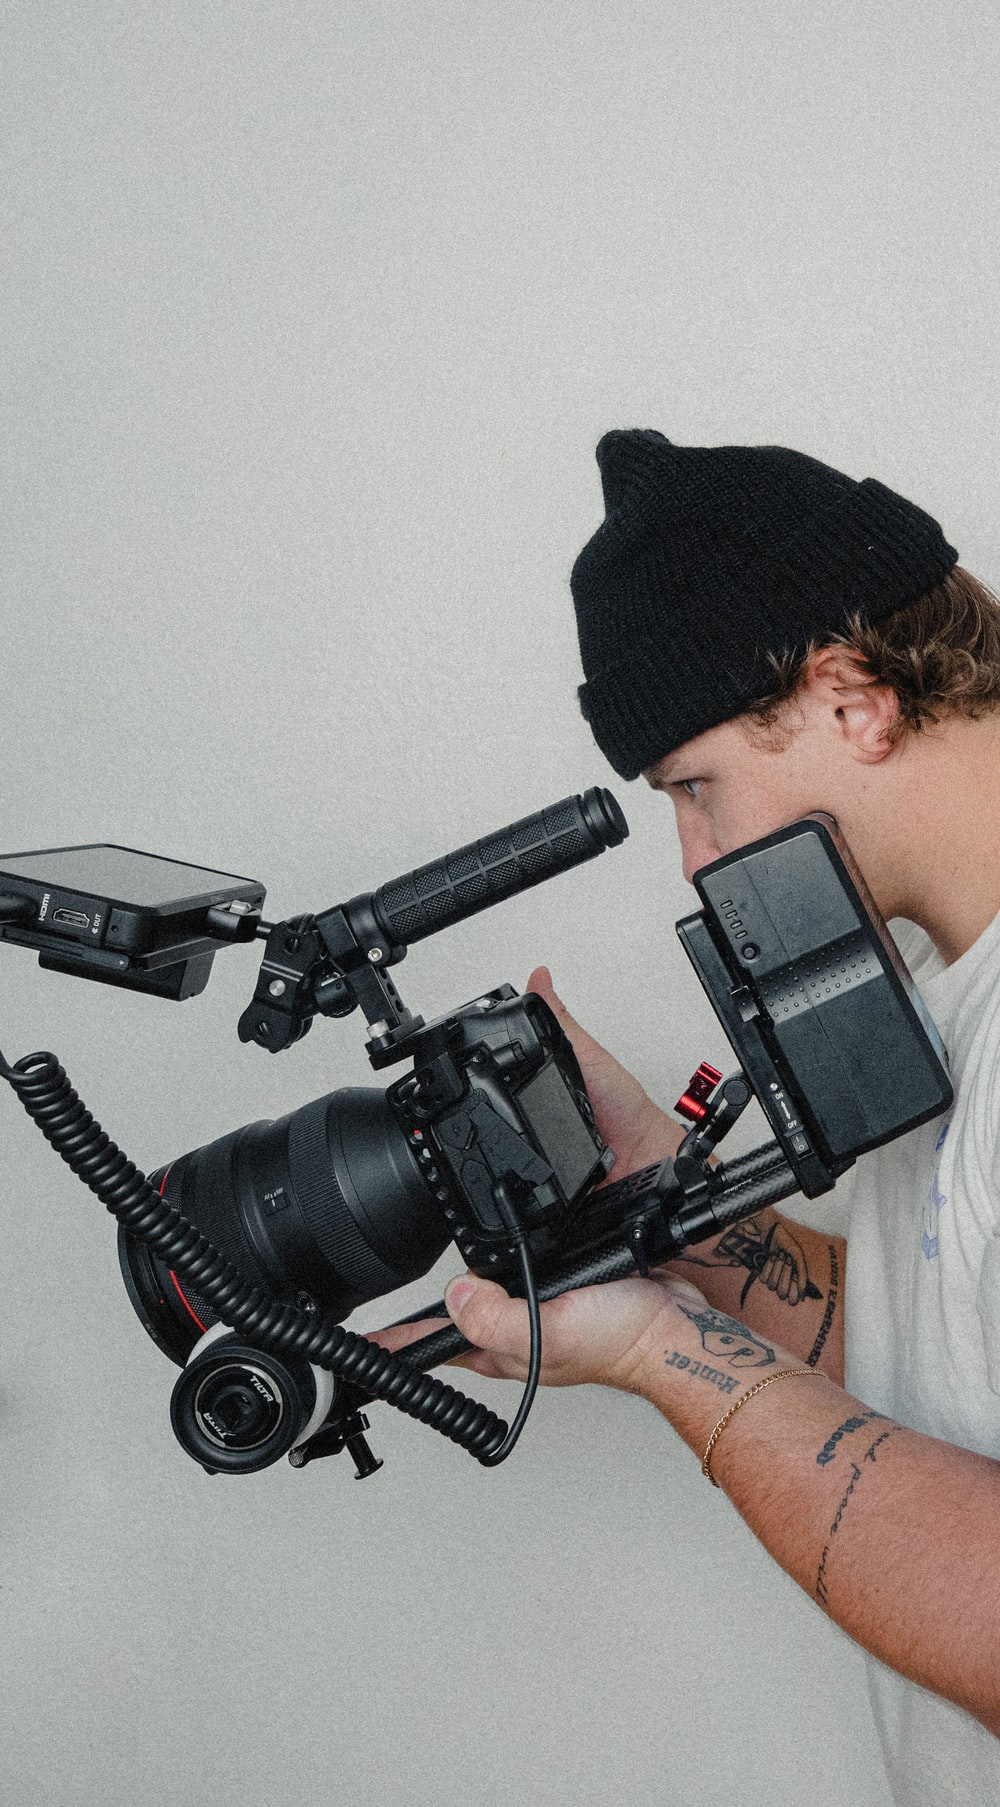 man in black knit cap holding black video camera